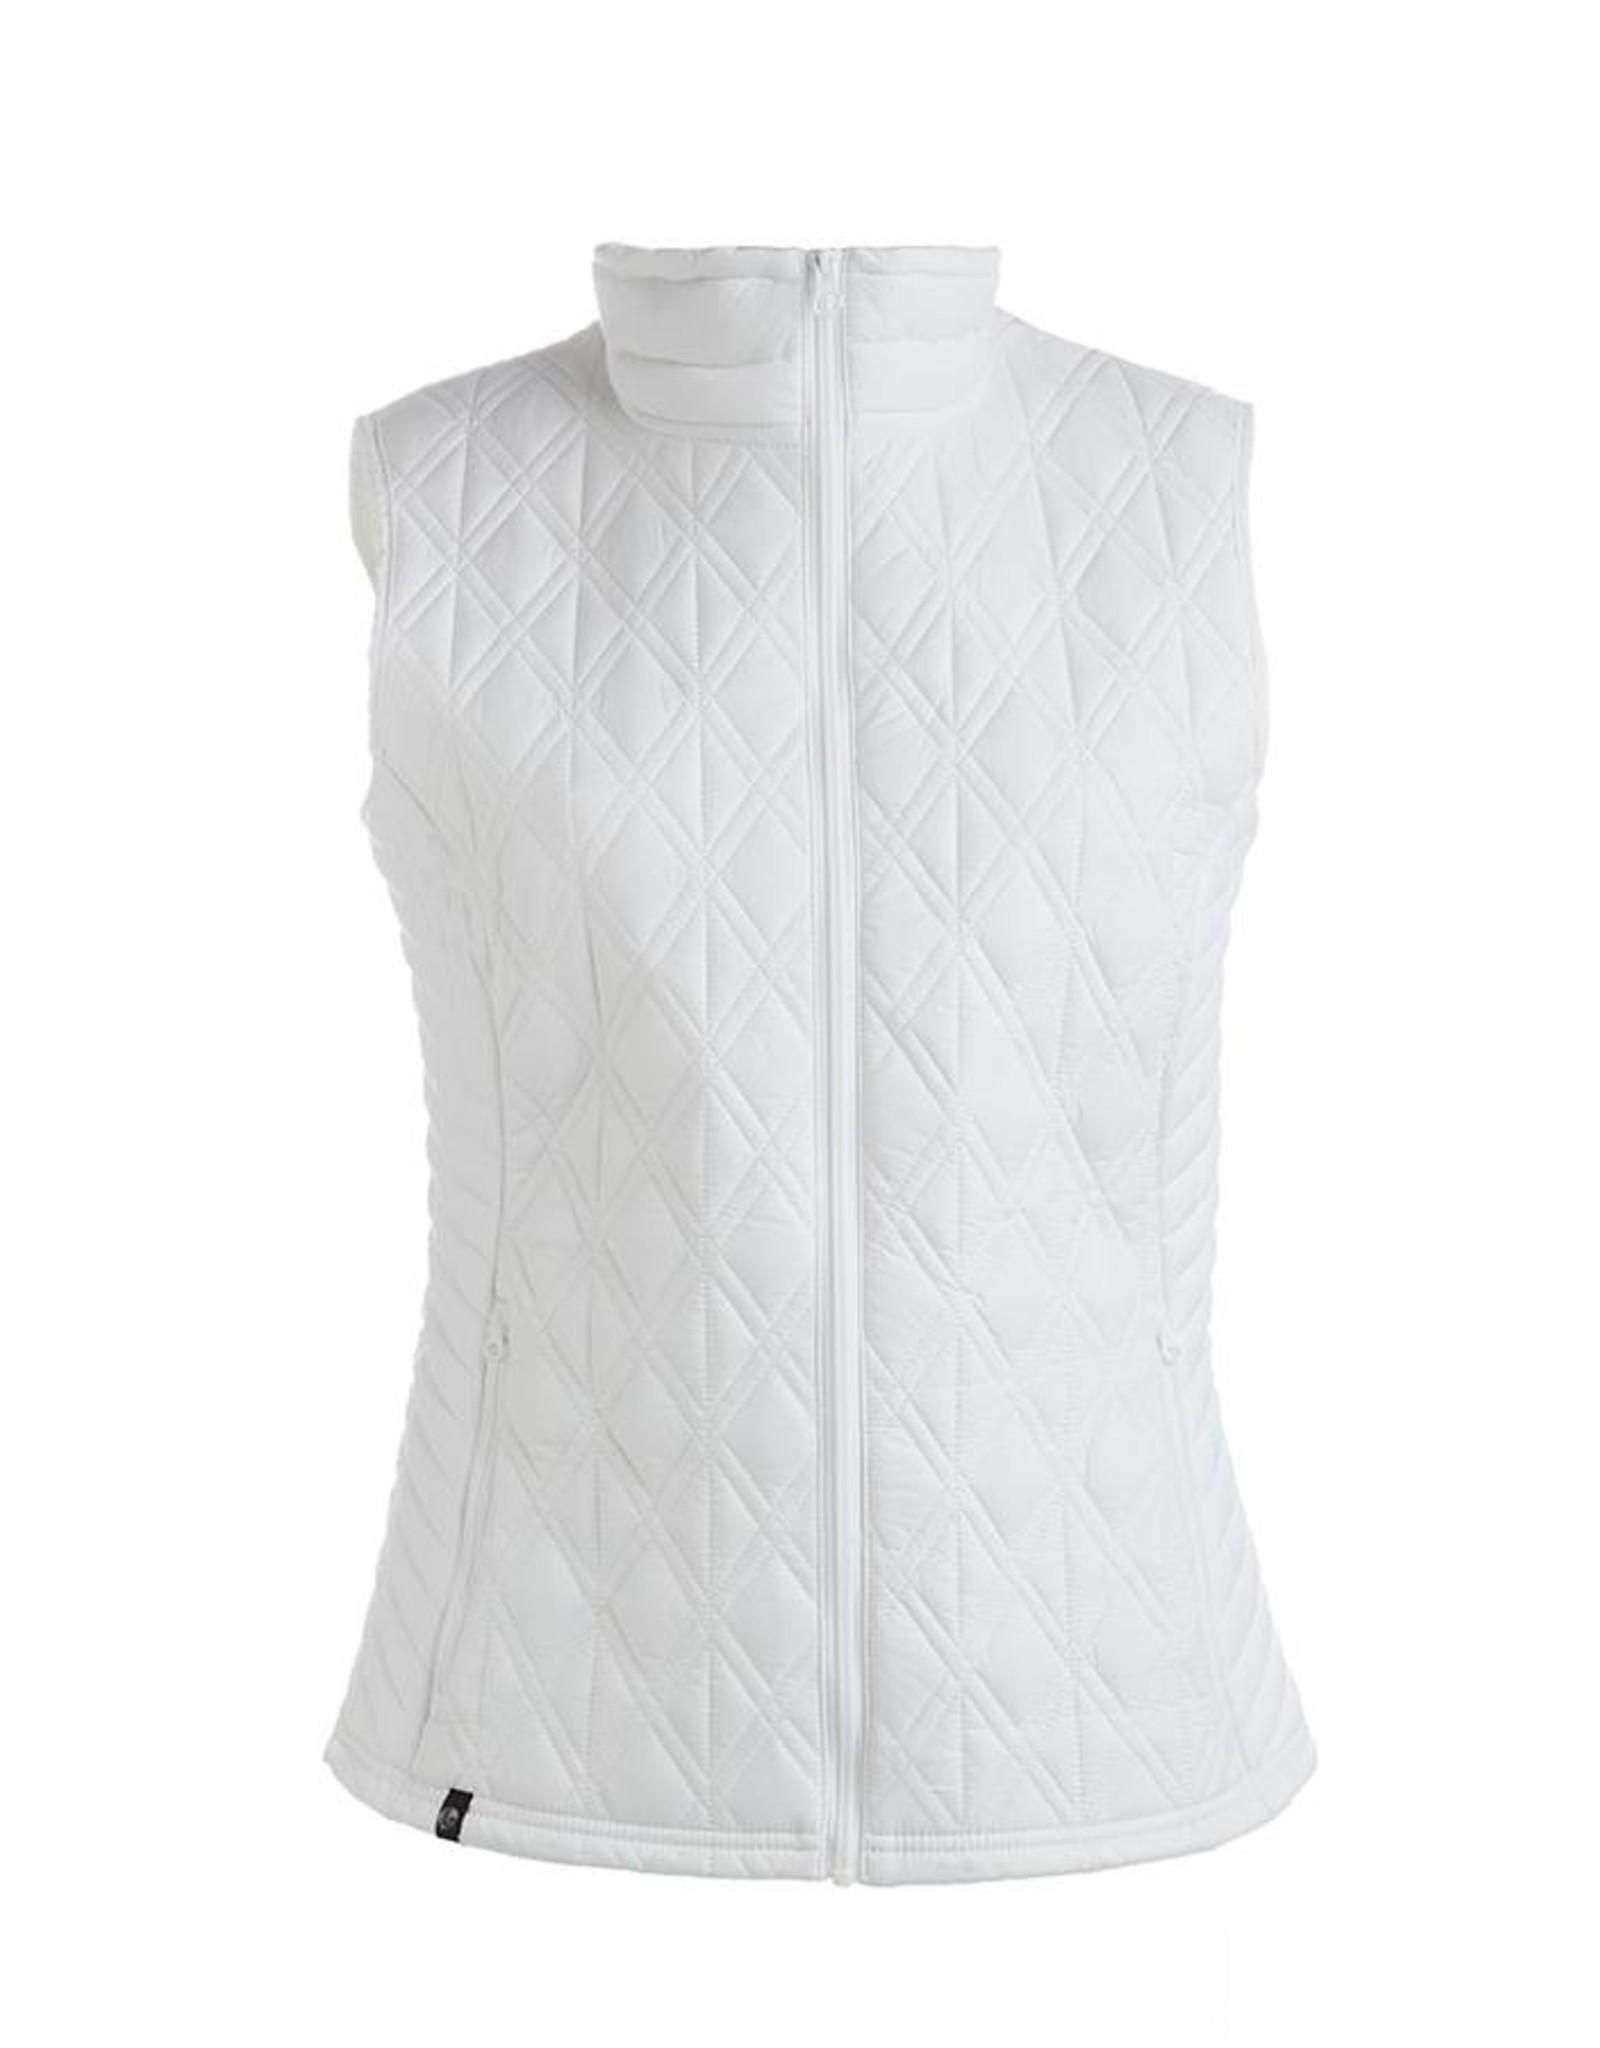 NILS NILS Katrina Women's Vest